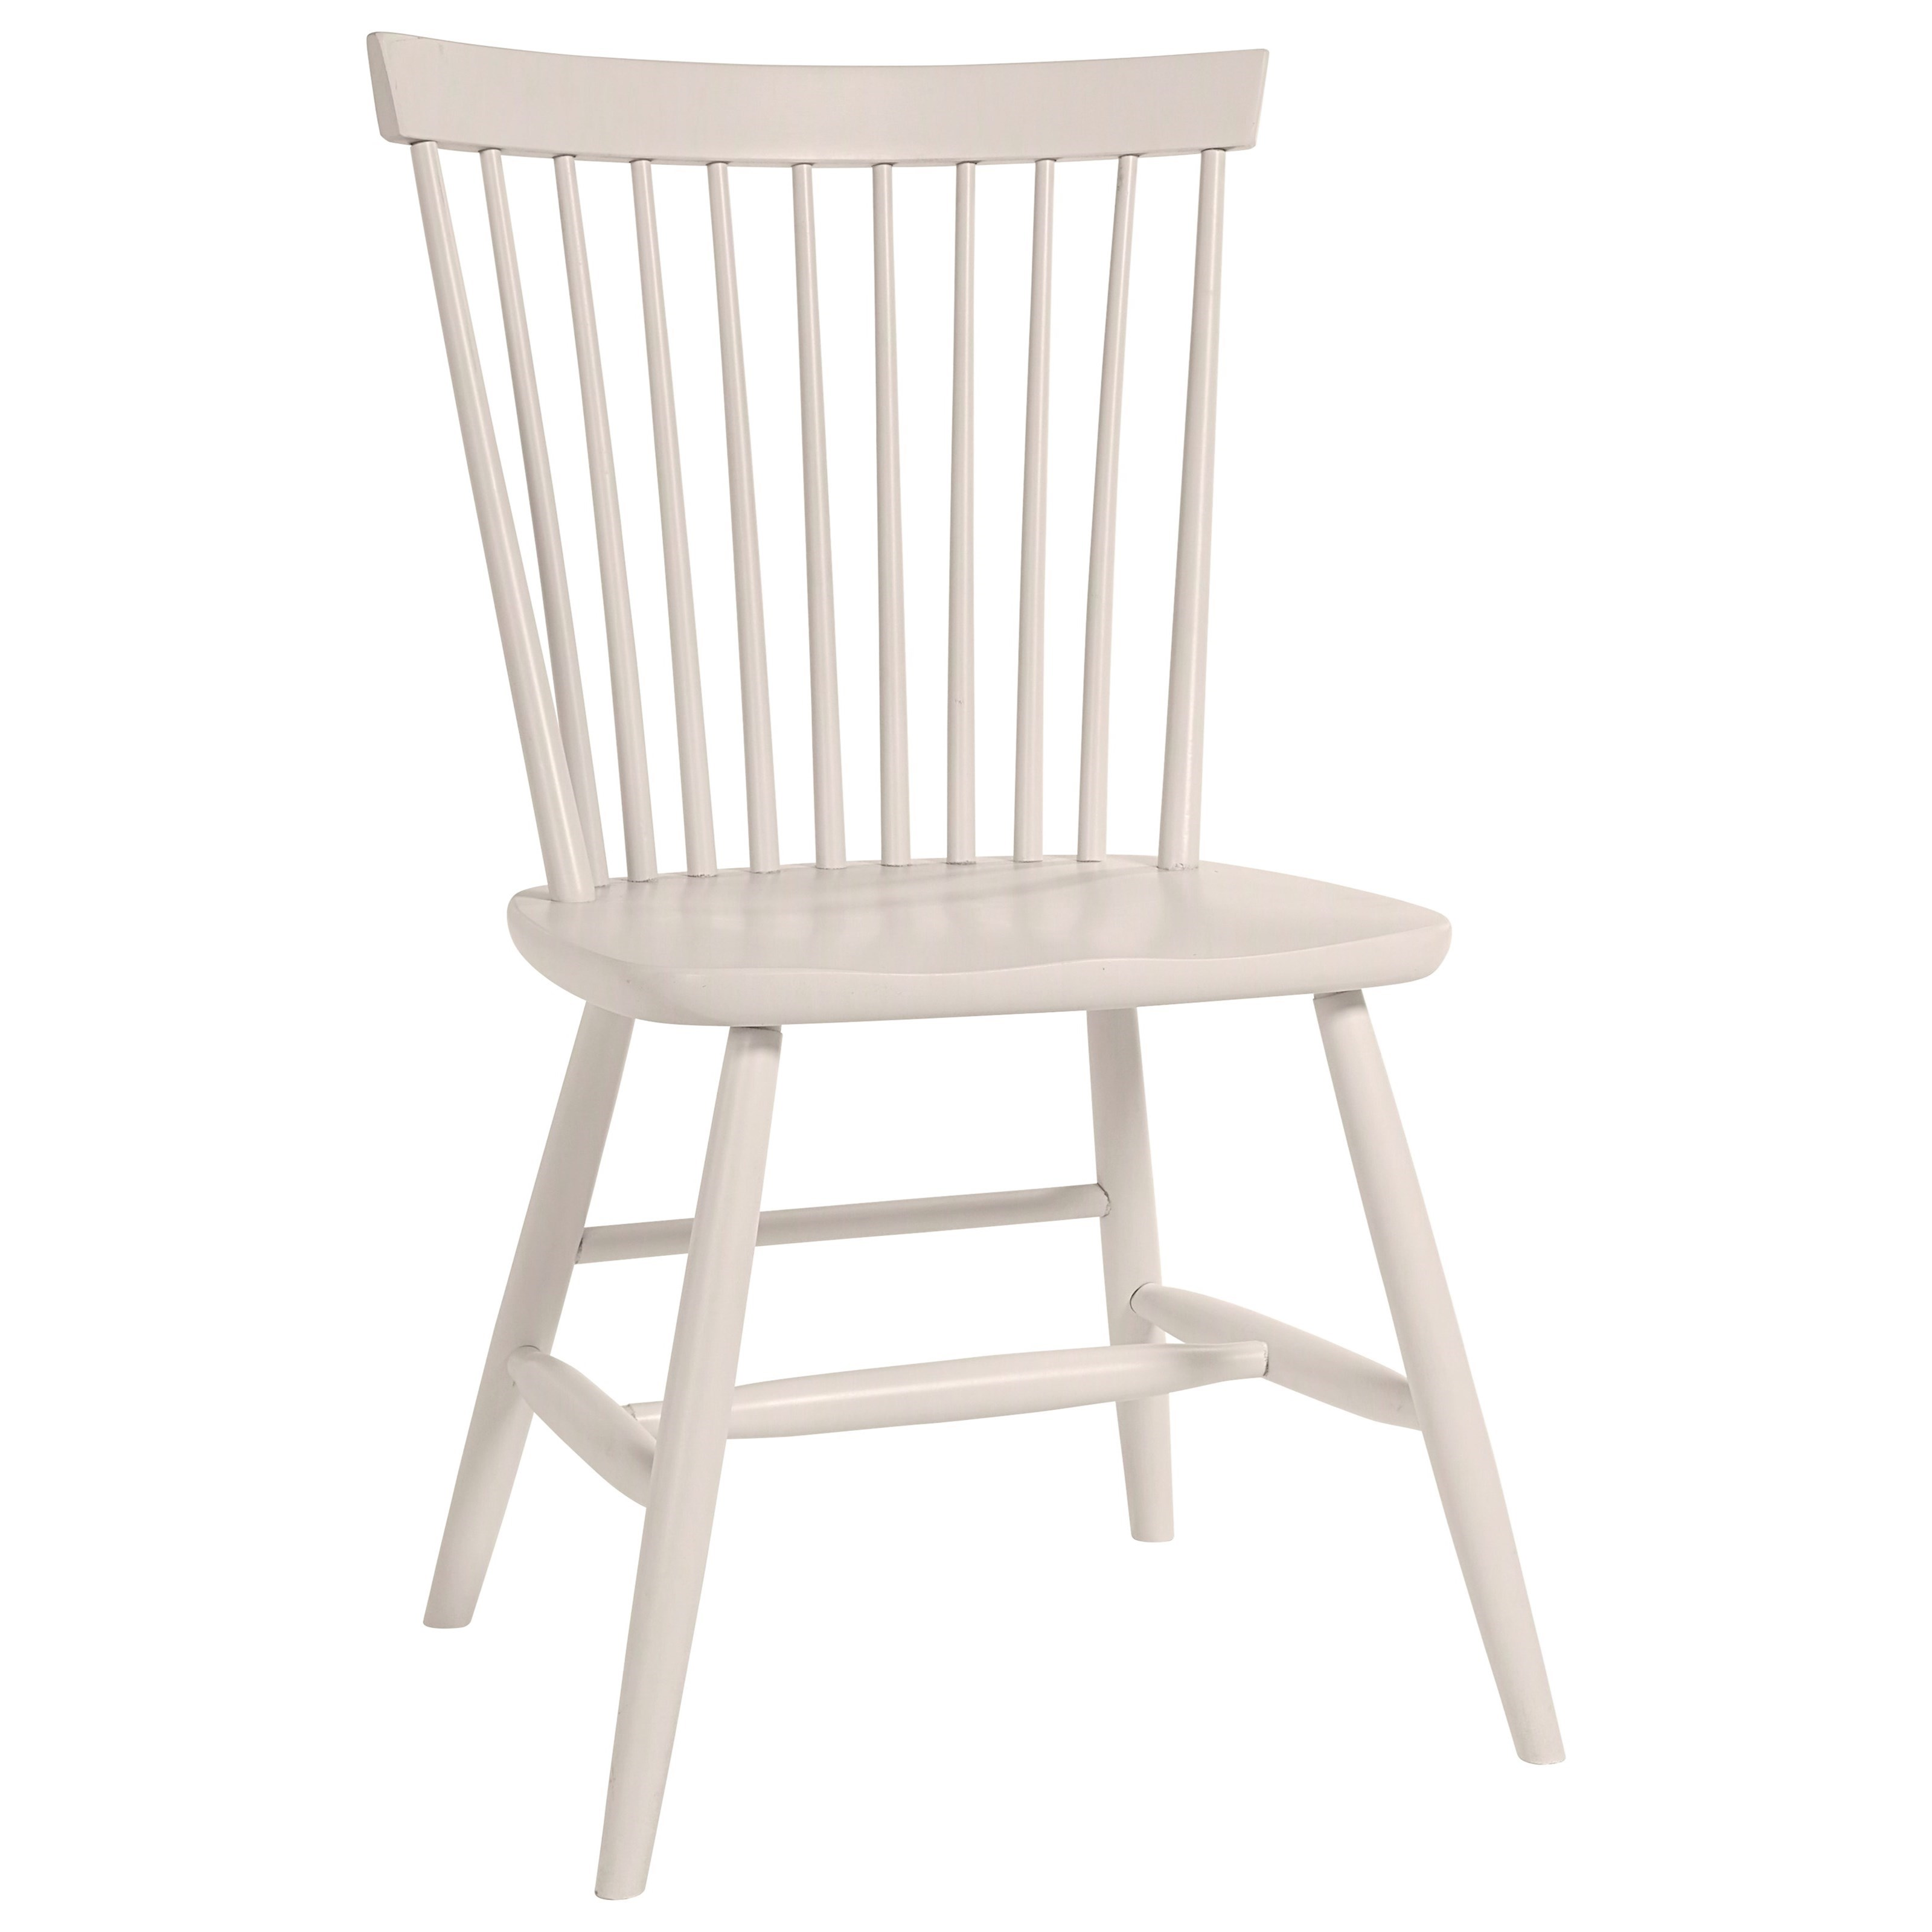 Bungalow Desk Chair by Vaughan-Bassett at Crowley Furniture & Mattress